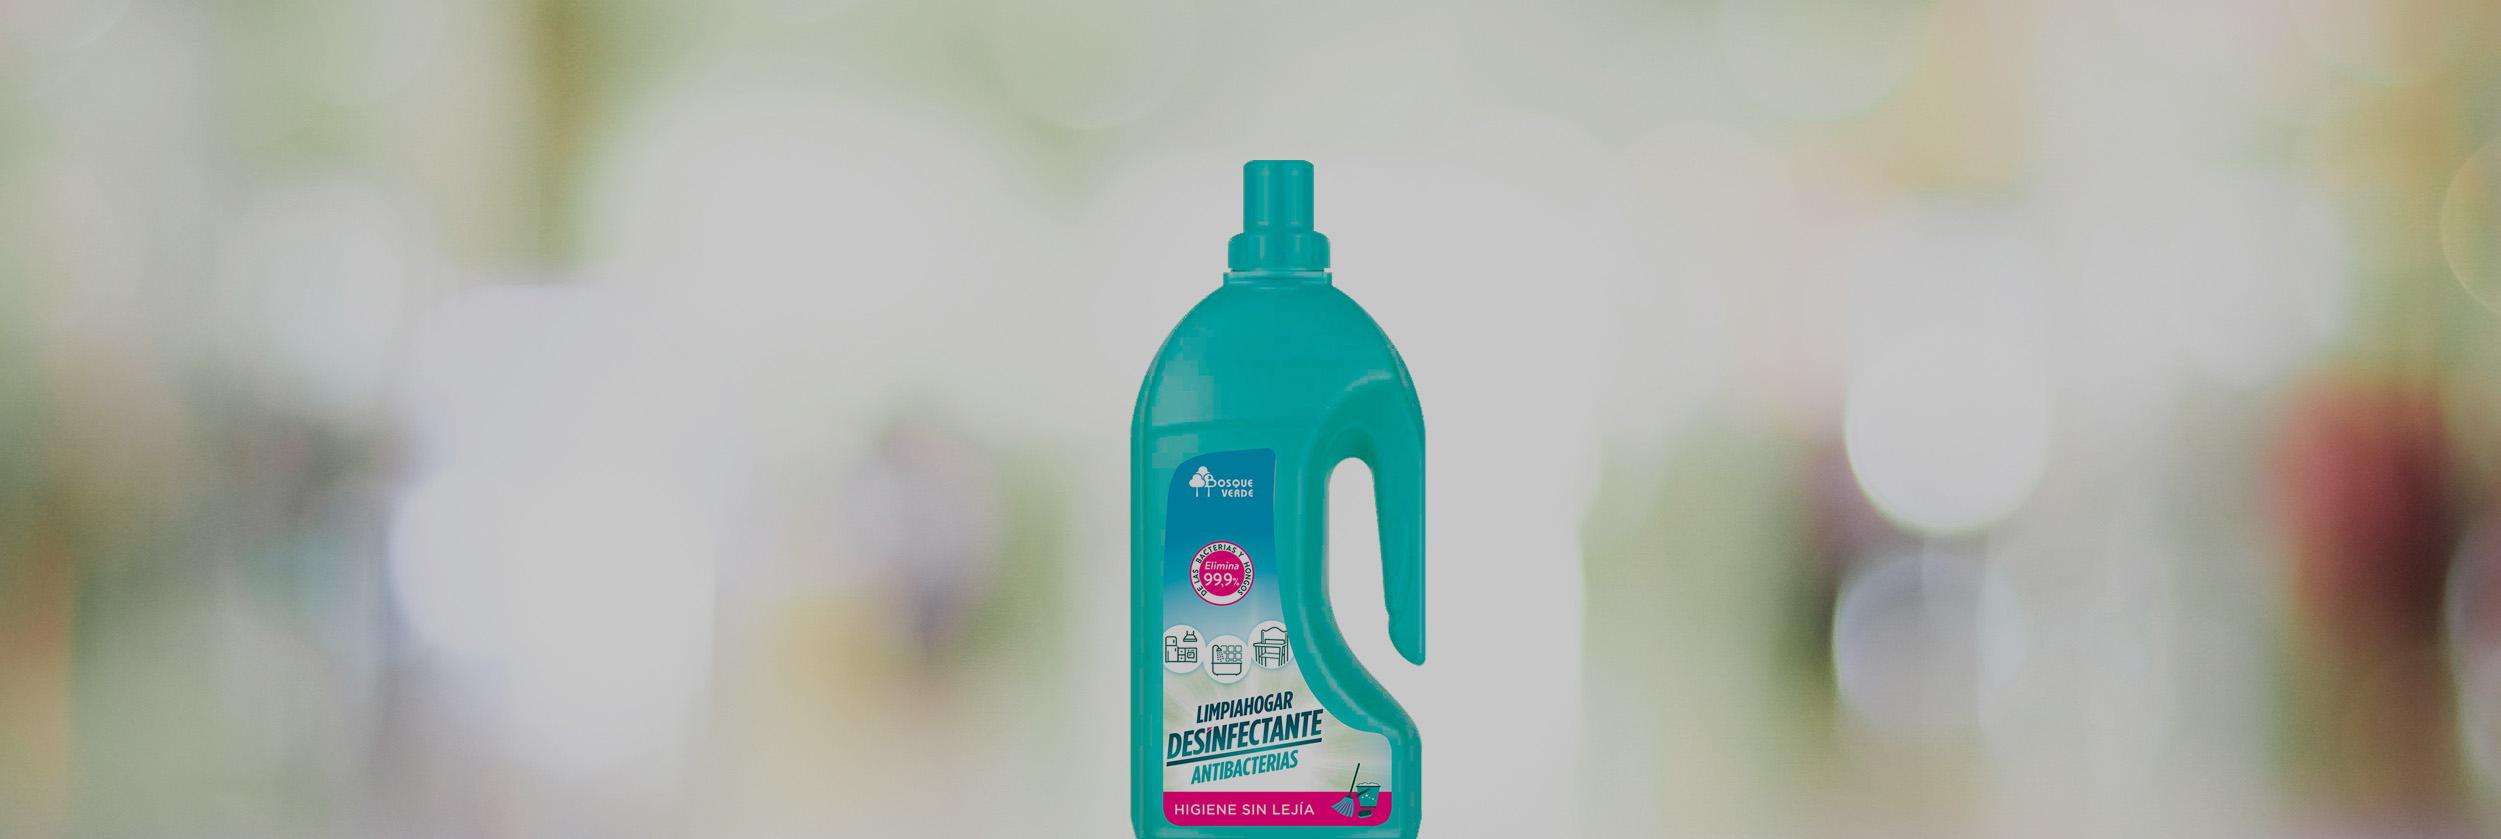 Limpiahogar Desinfectante Antibacterias Bosque Verde · SPB Contigo